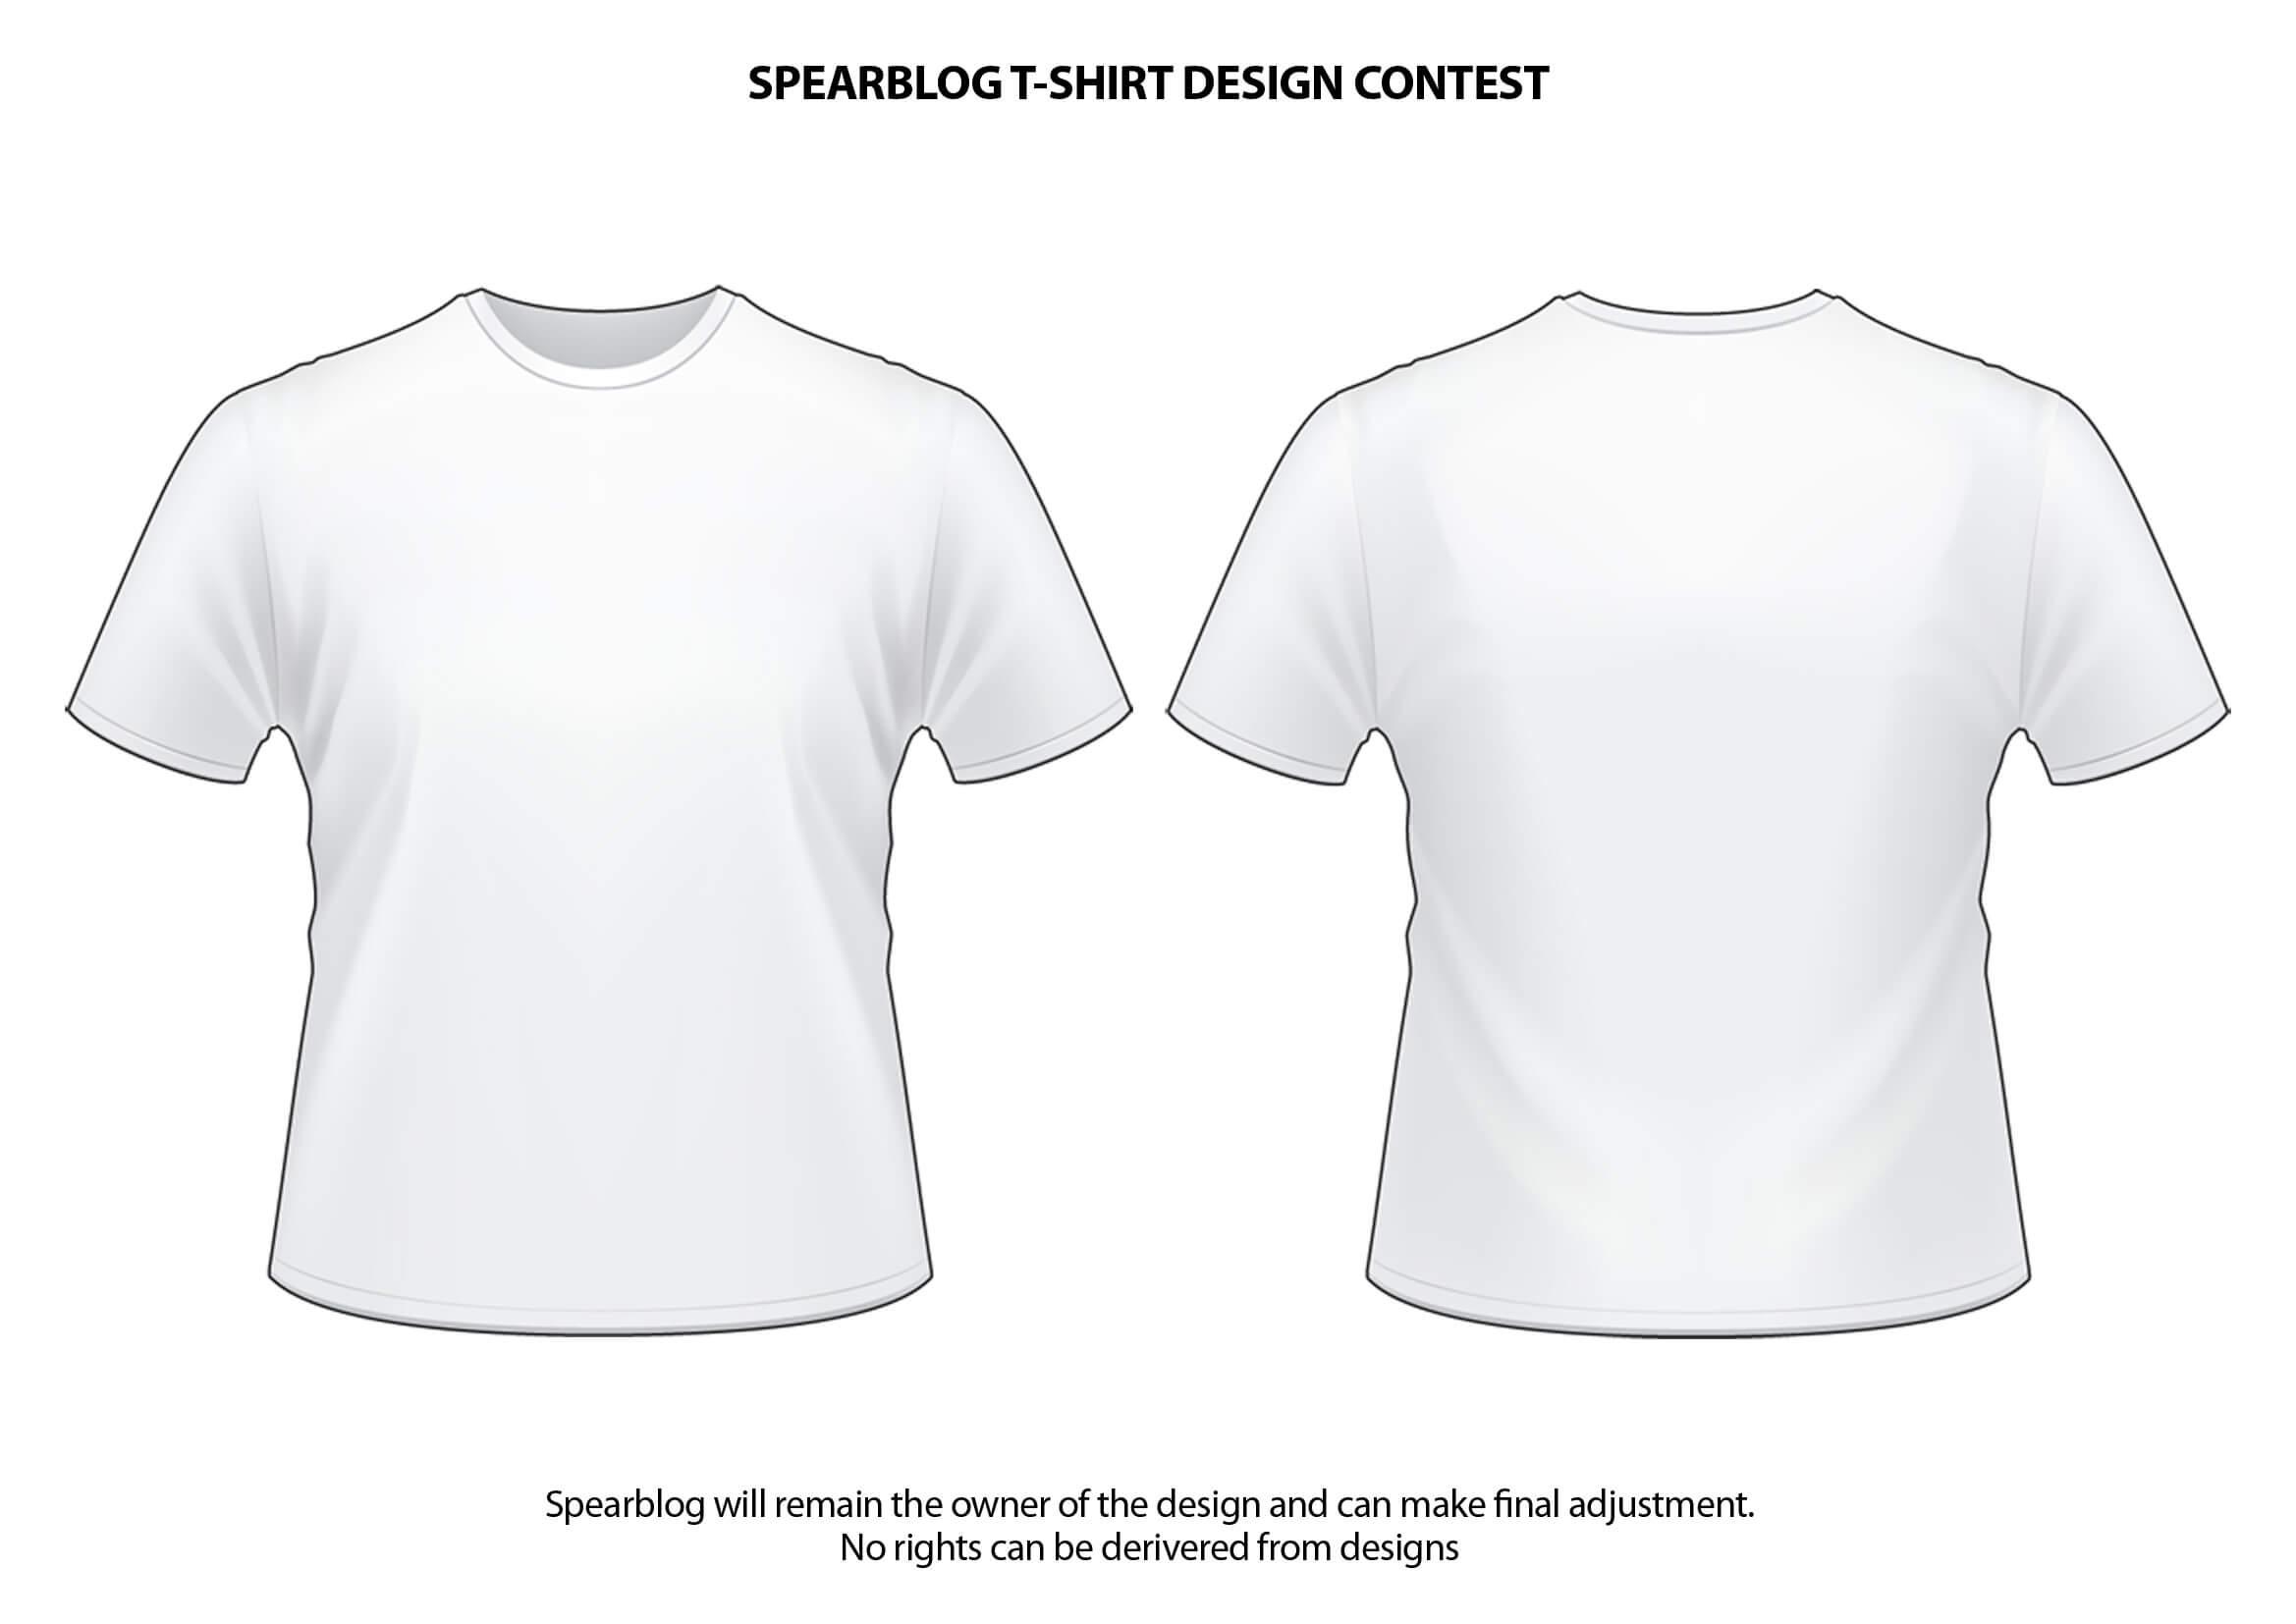 Blank T Shirt Psd Template | Azərbaycan Dillər Universiteti Throughout Blank T Shirt Design Template Psd